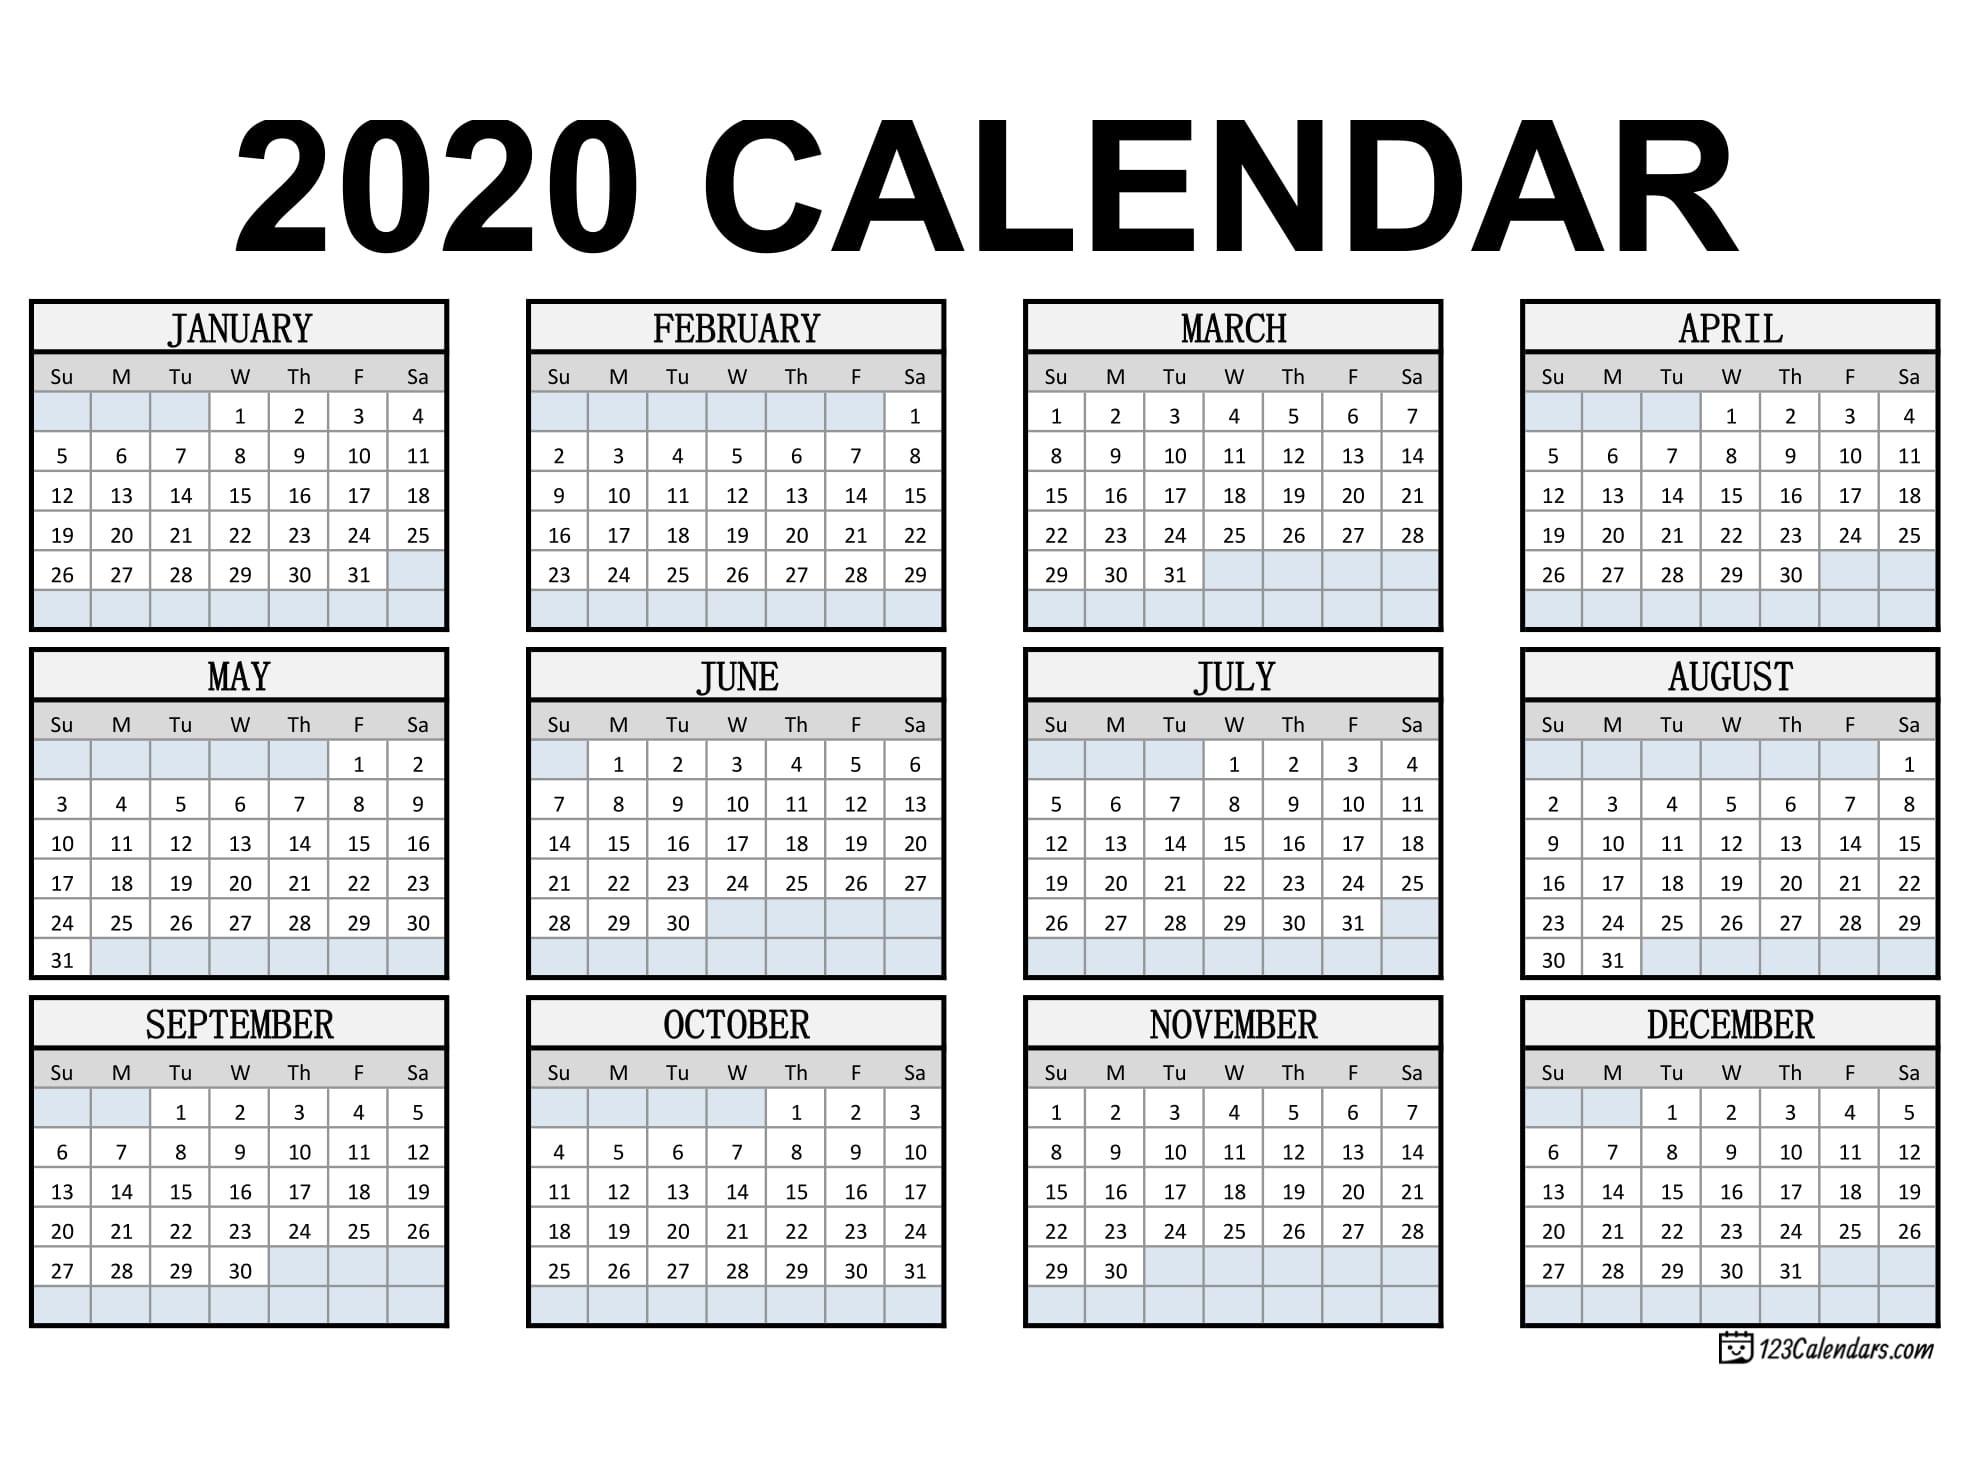 Free Printable 2020 Calendar | 123Calendars  Printable Checkbook Size Calendar